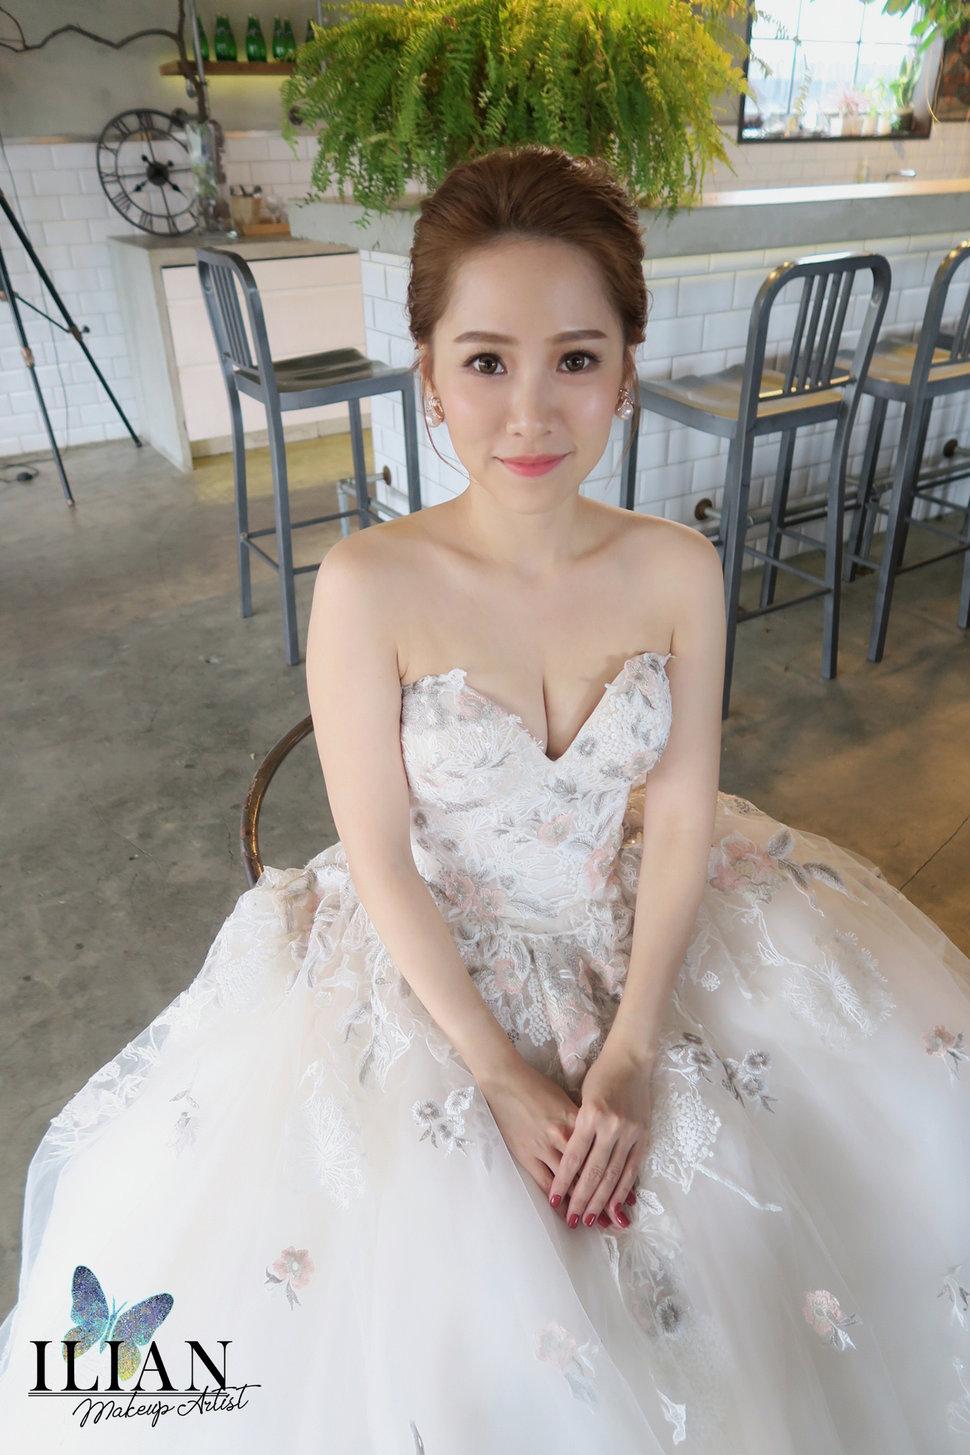 20191126074841_mr1574848400951 - ilian藍專業彩妝造型《結婚吧》